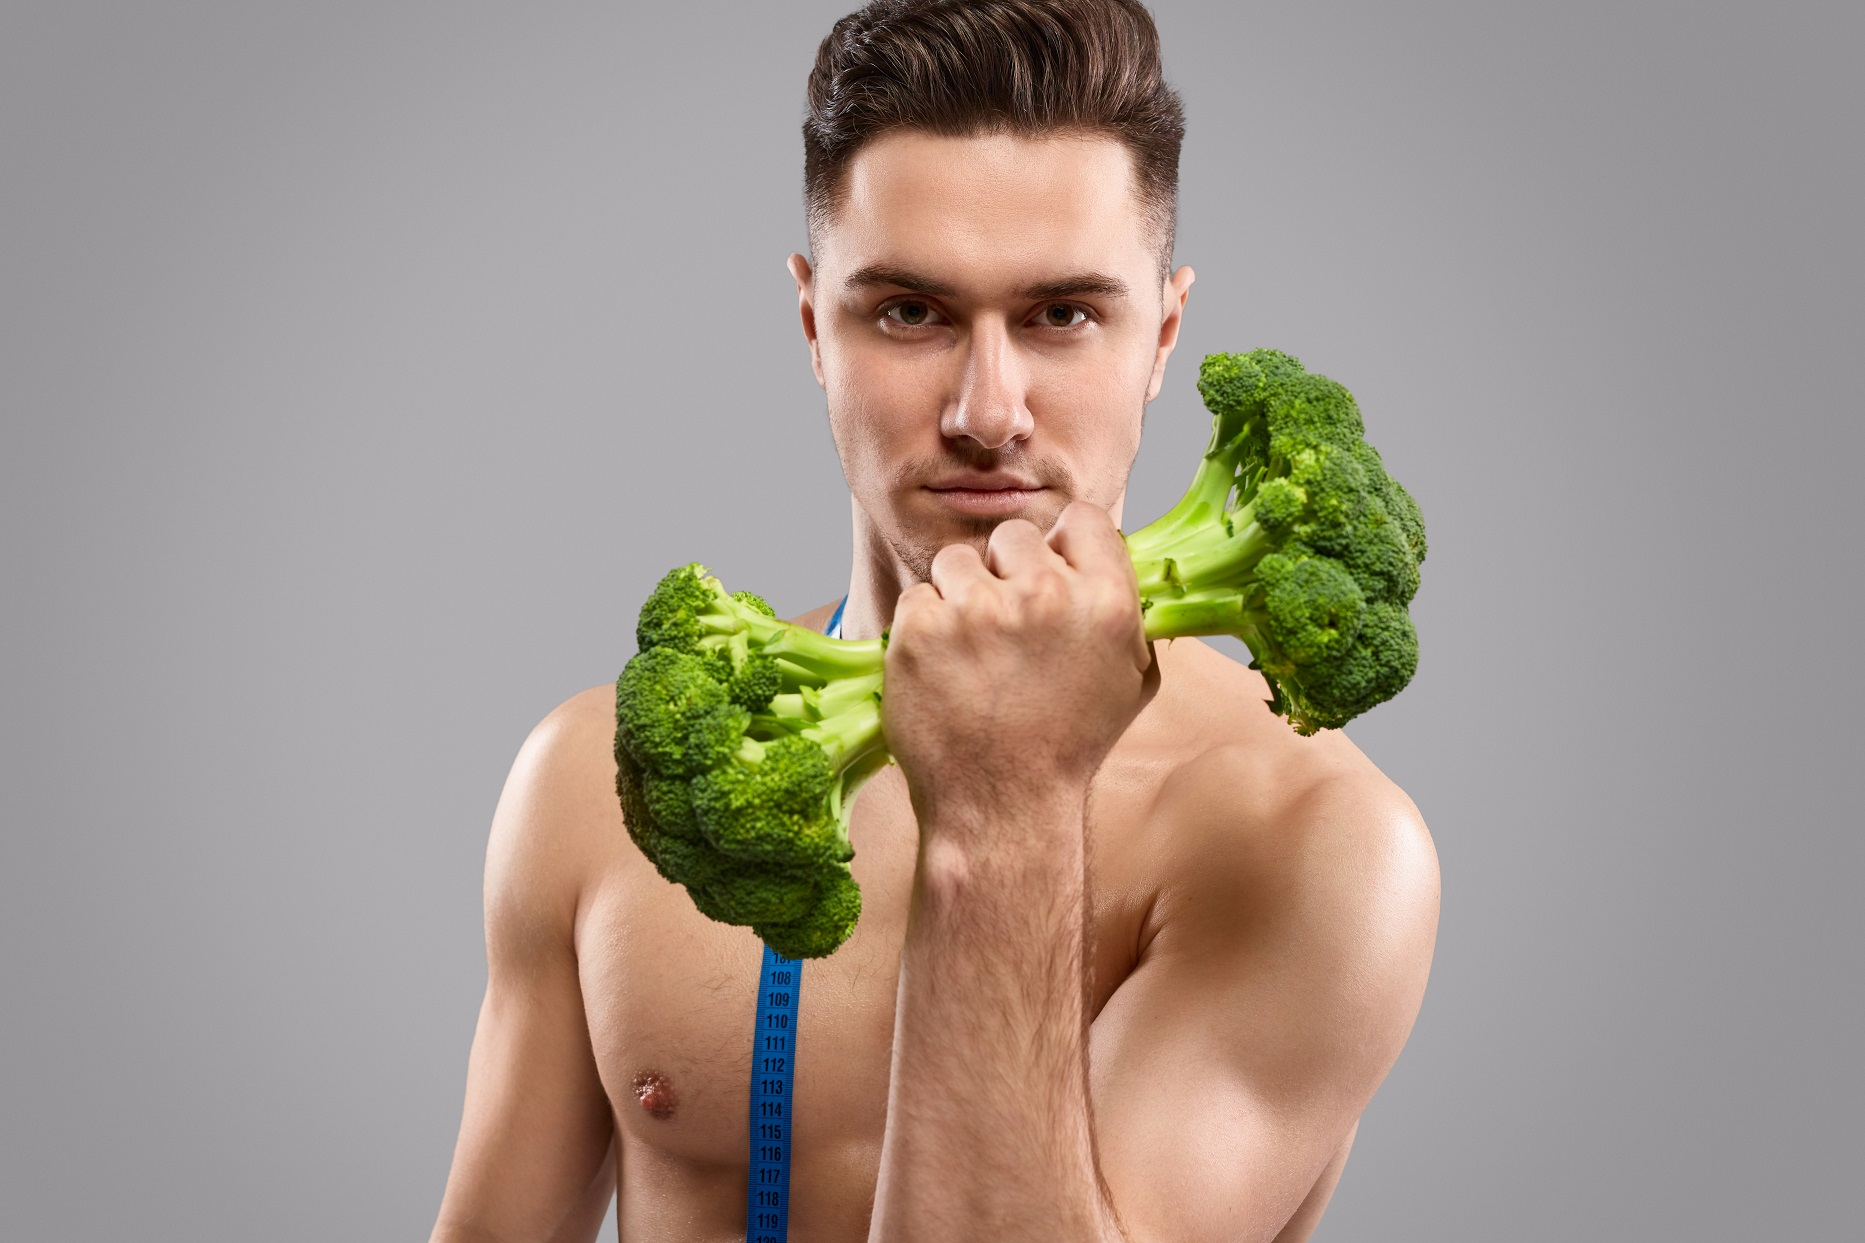 man beim sport mit brokkoli als hantel